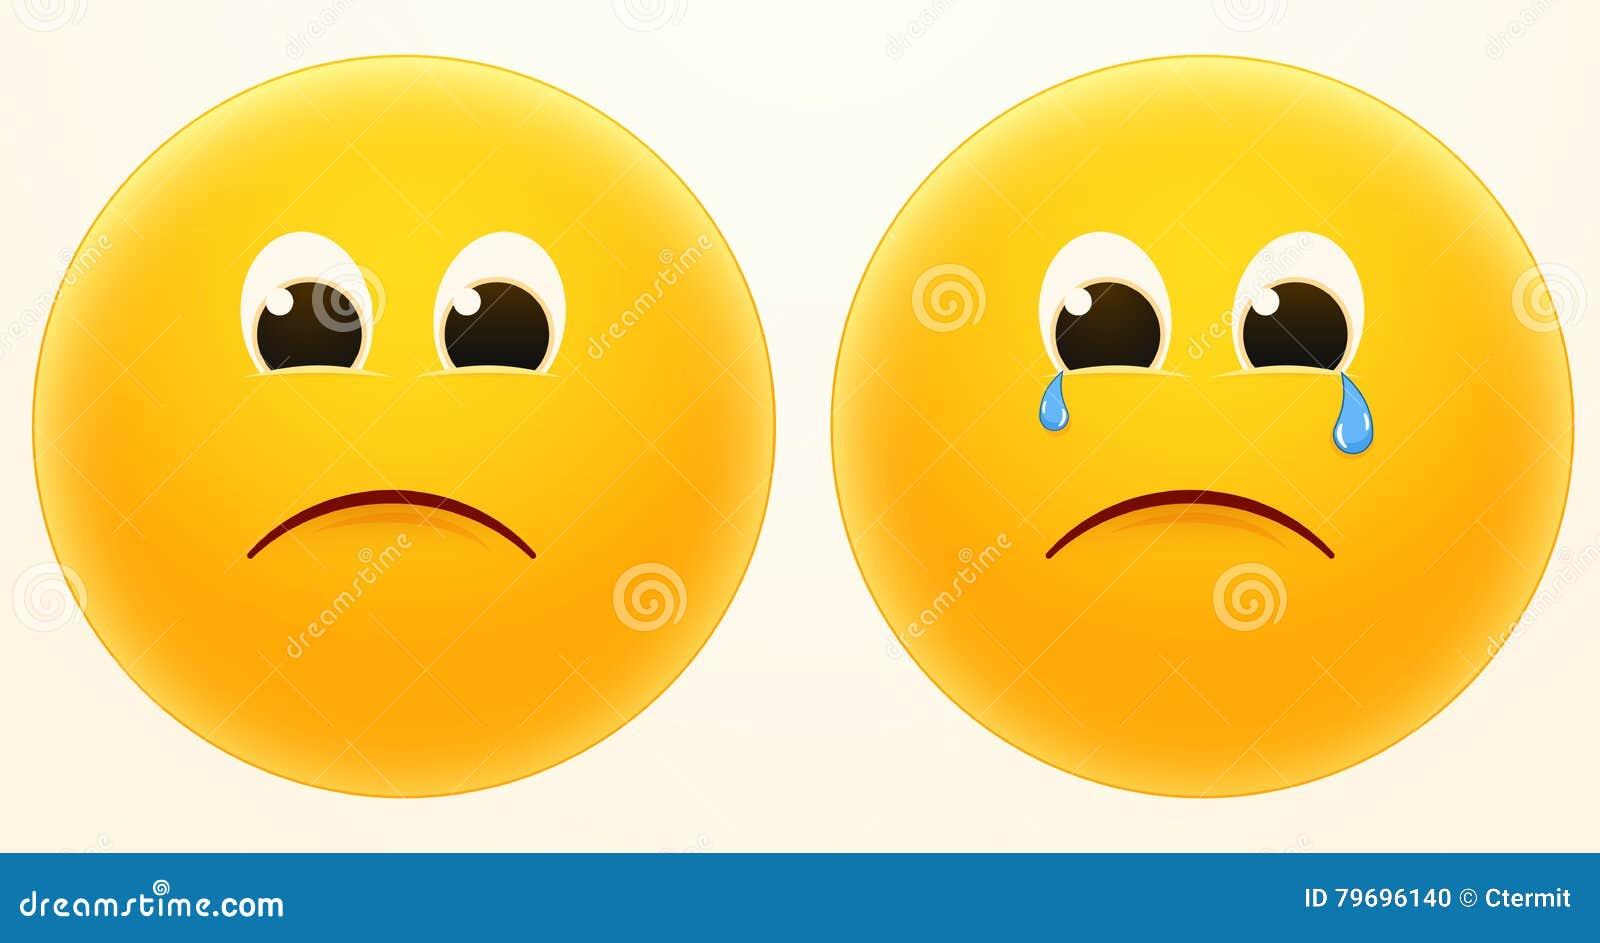 Sad smiley faces, melancholy smilies : Big